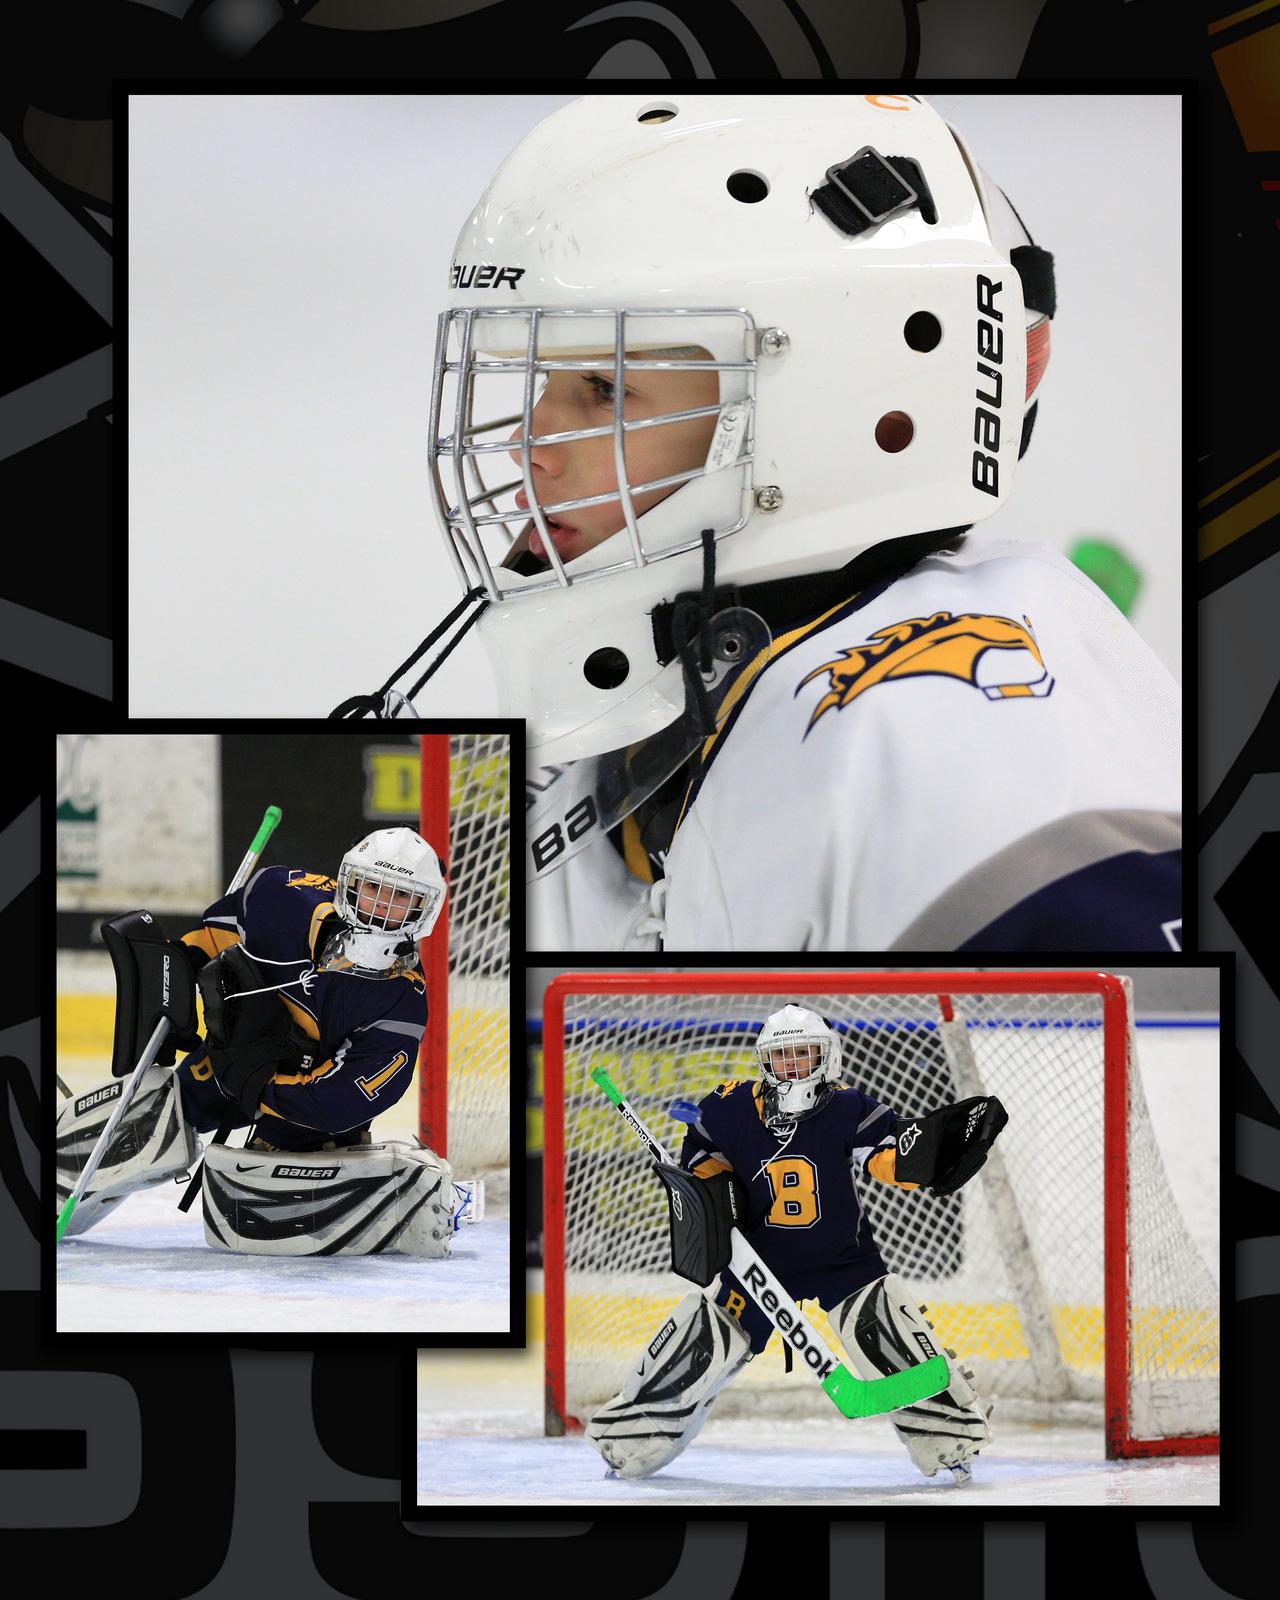 SilverPeak Studios Commemorative Poster Samples Action Sports Hockey Photography (17)